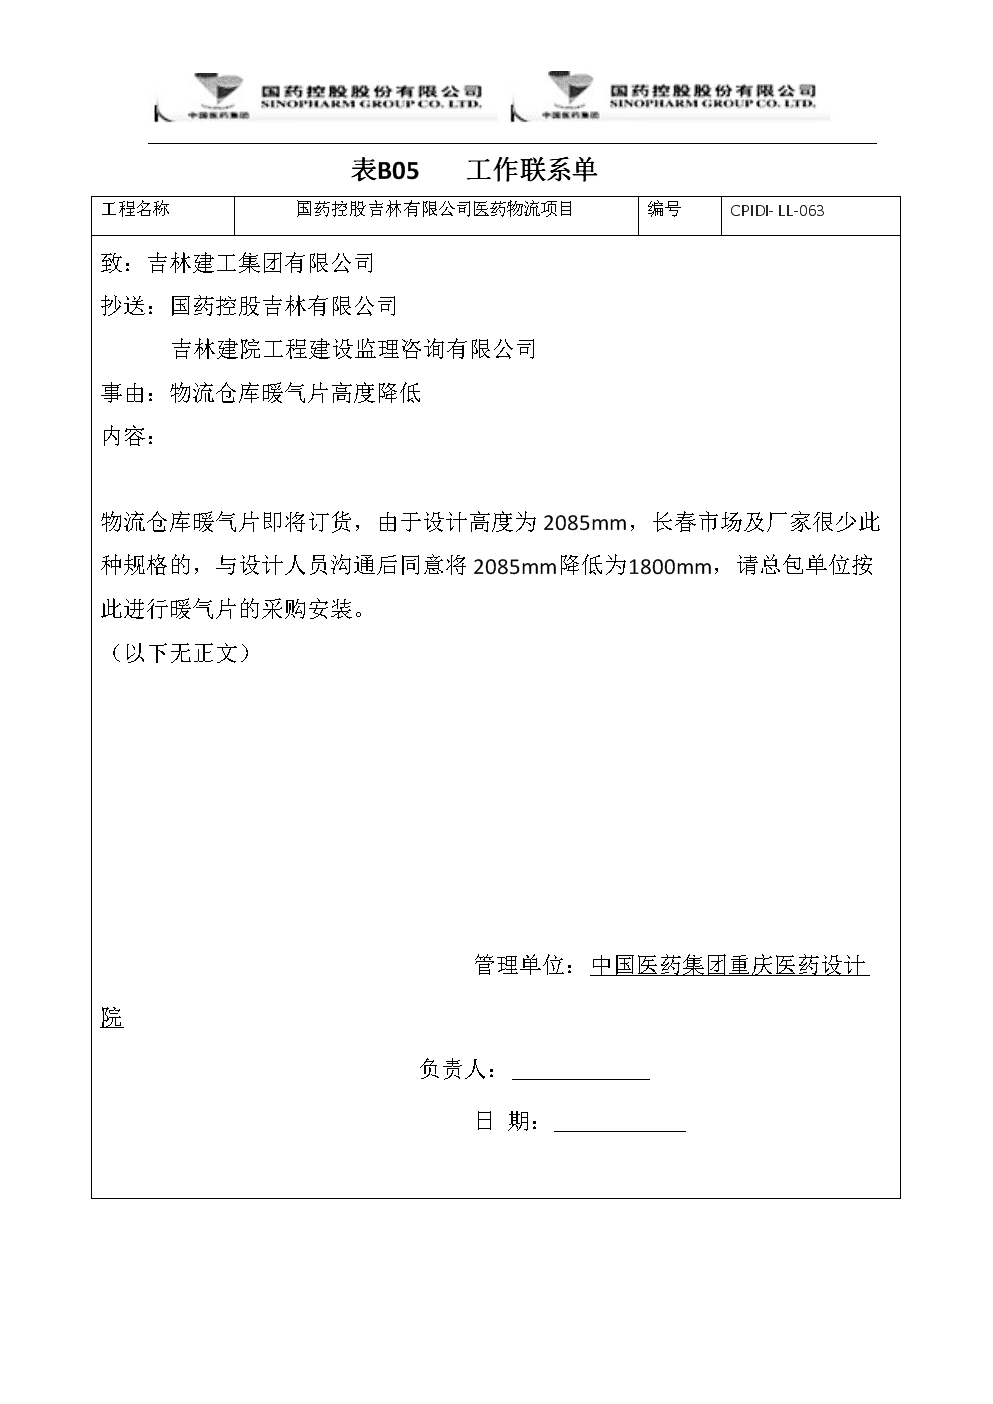 CPIDI- LL-063物流仓库暖气片高度变更.doc